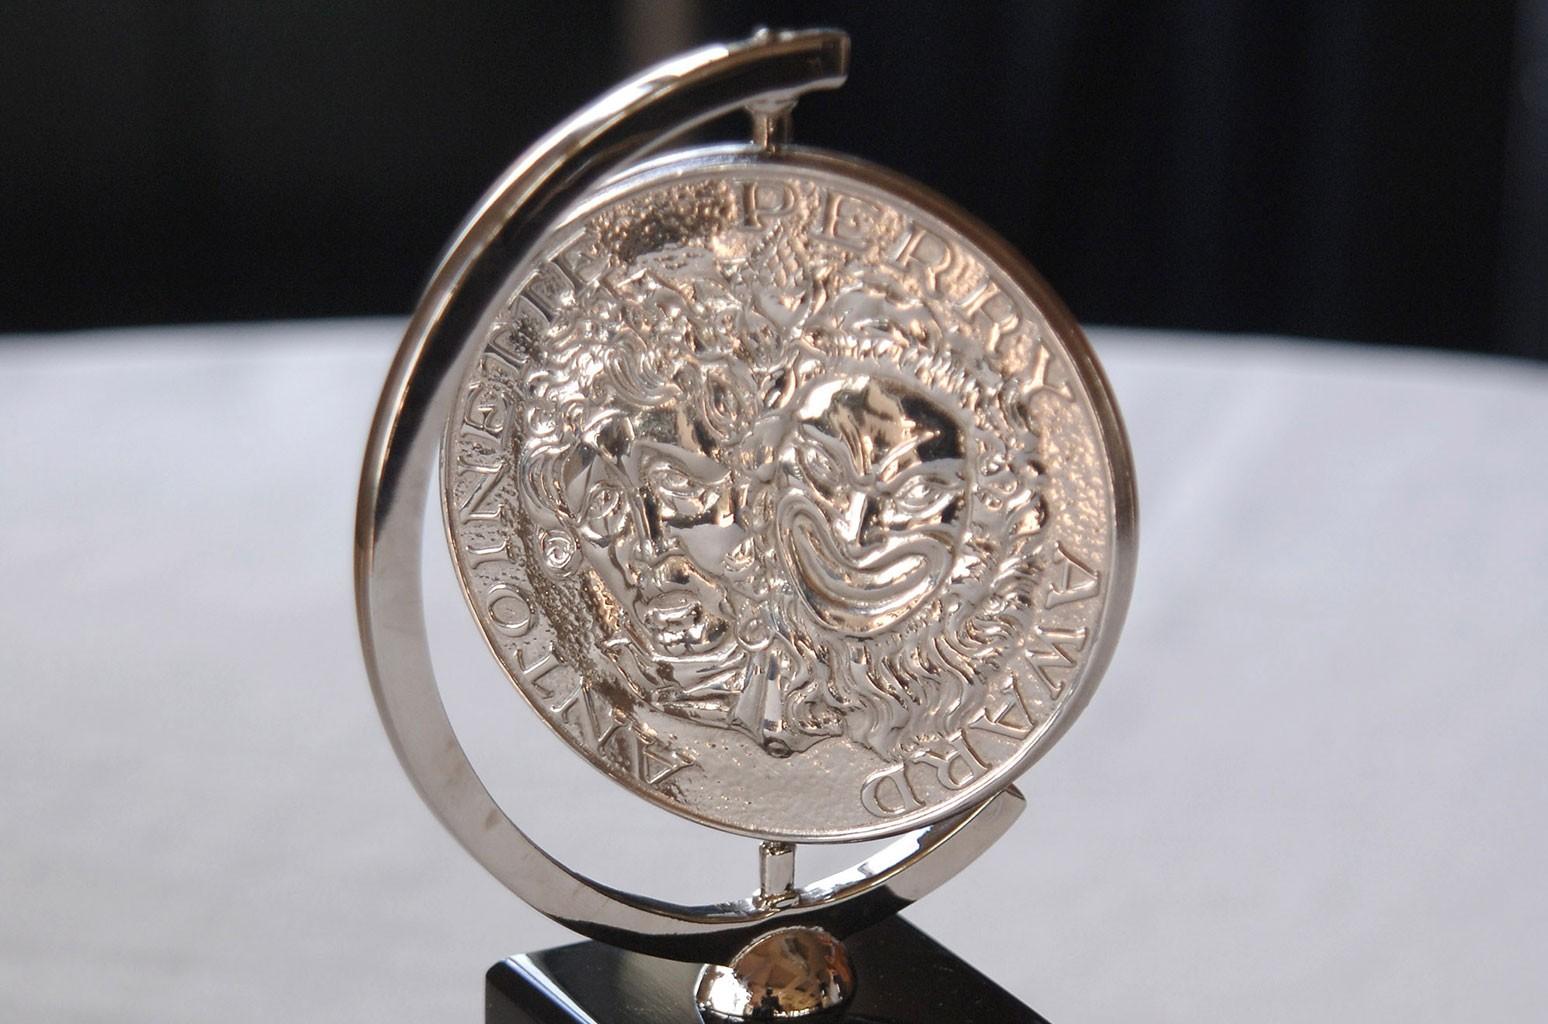 Tony Awards 2021: Full List of Winners